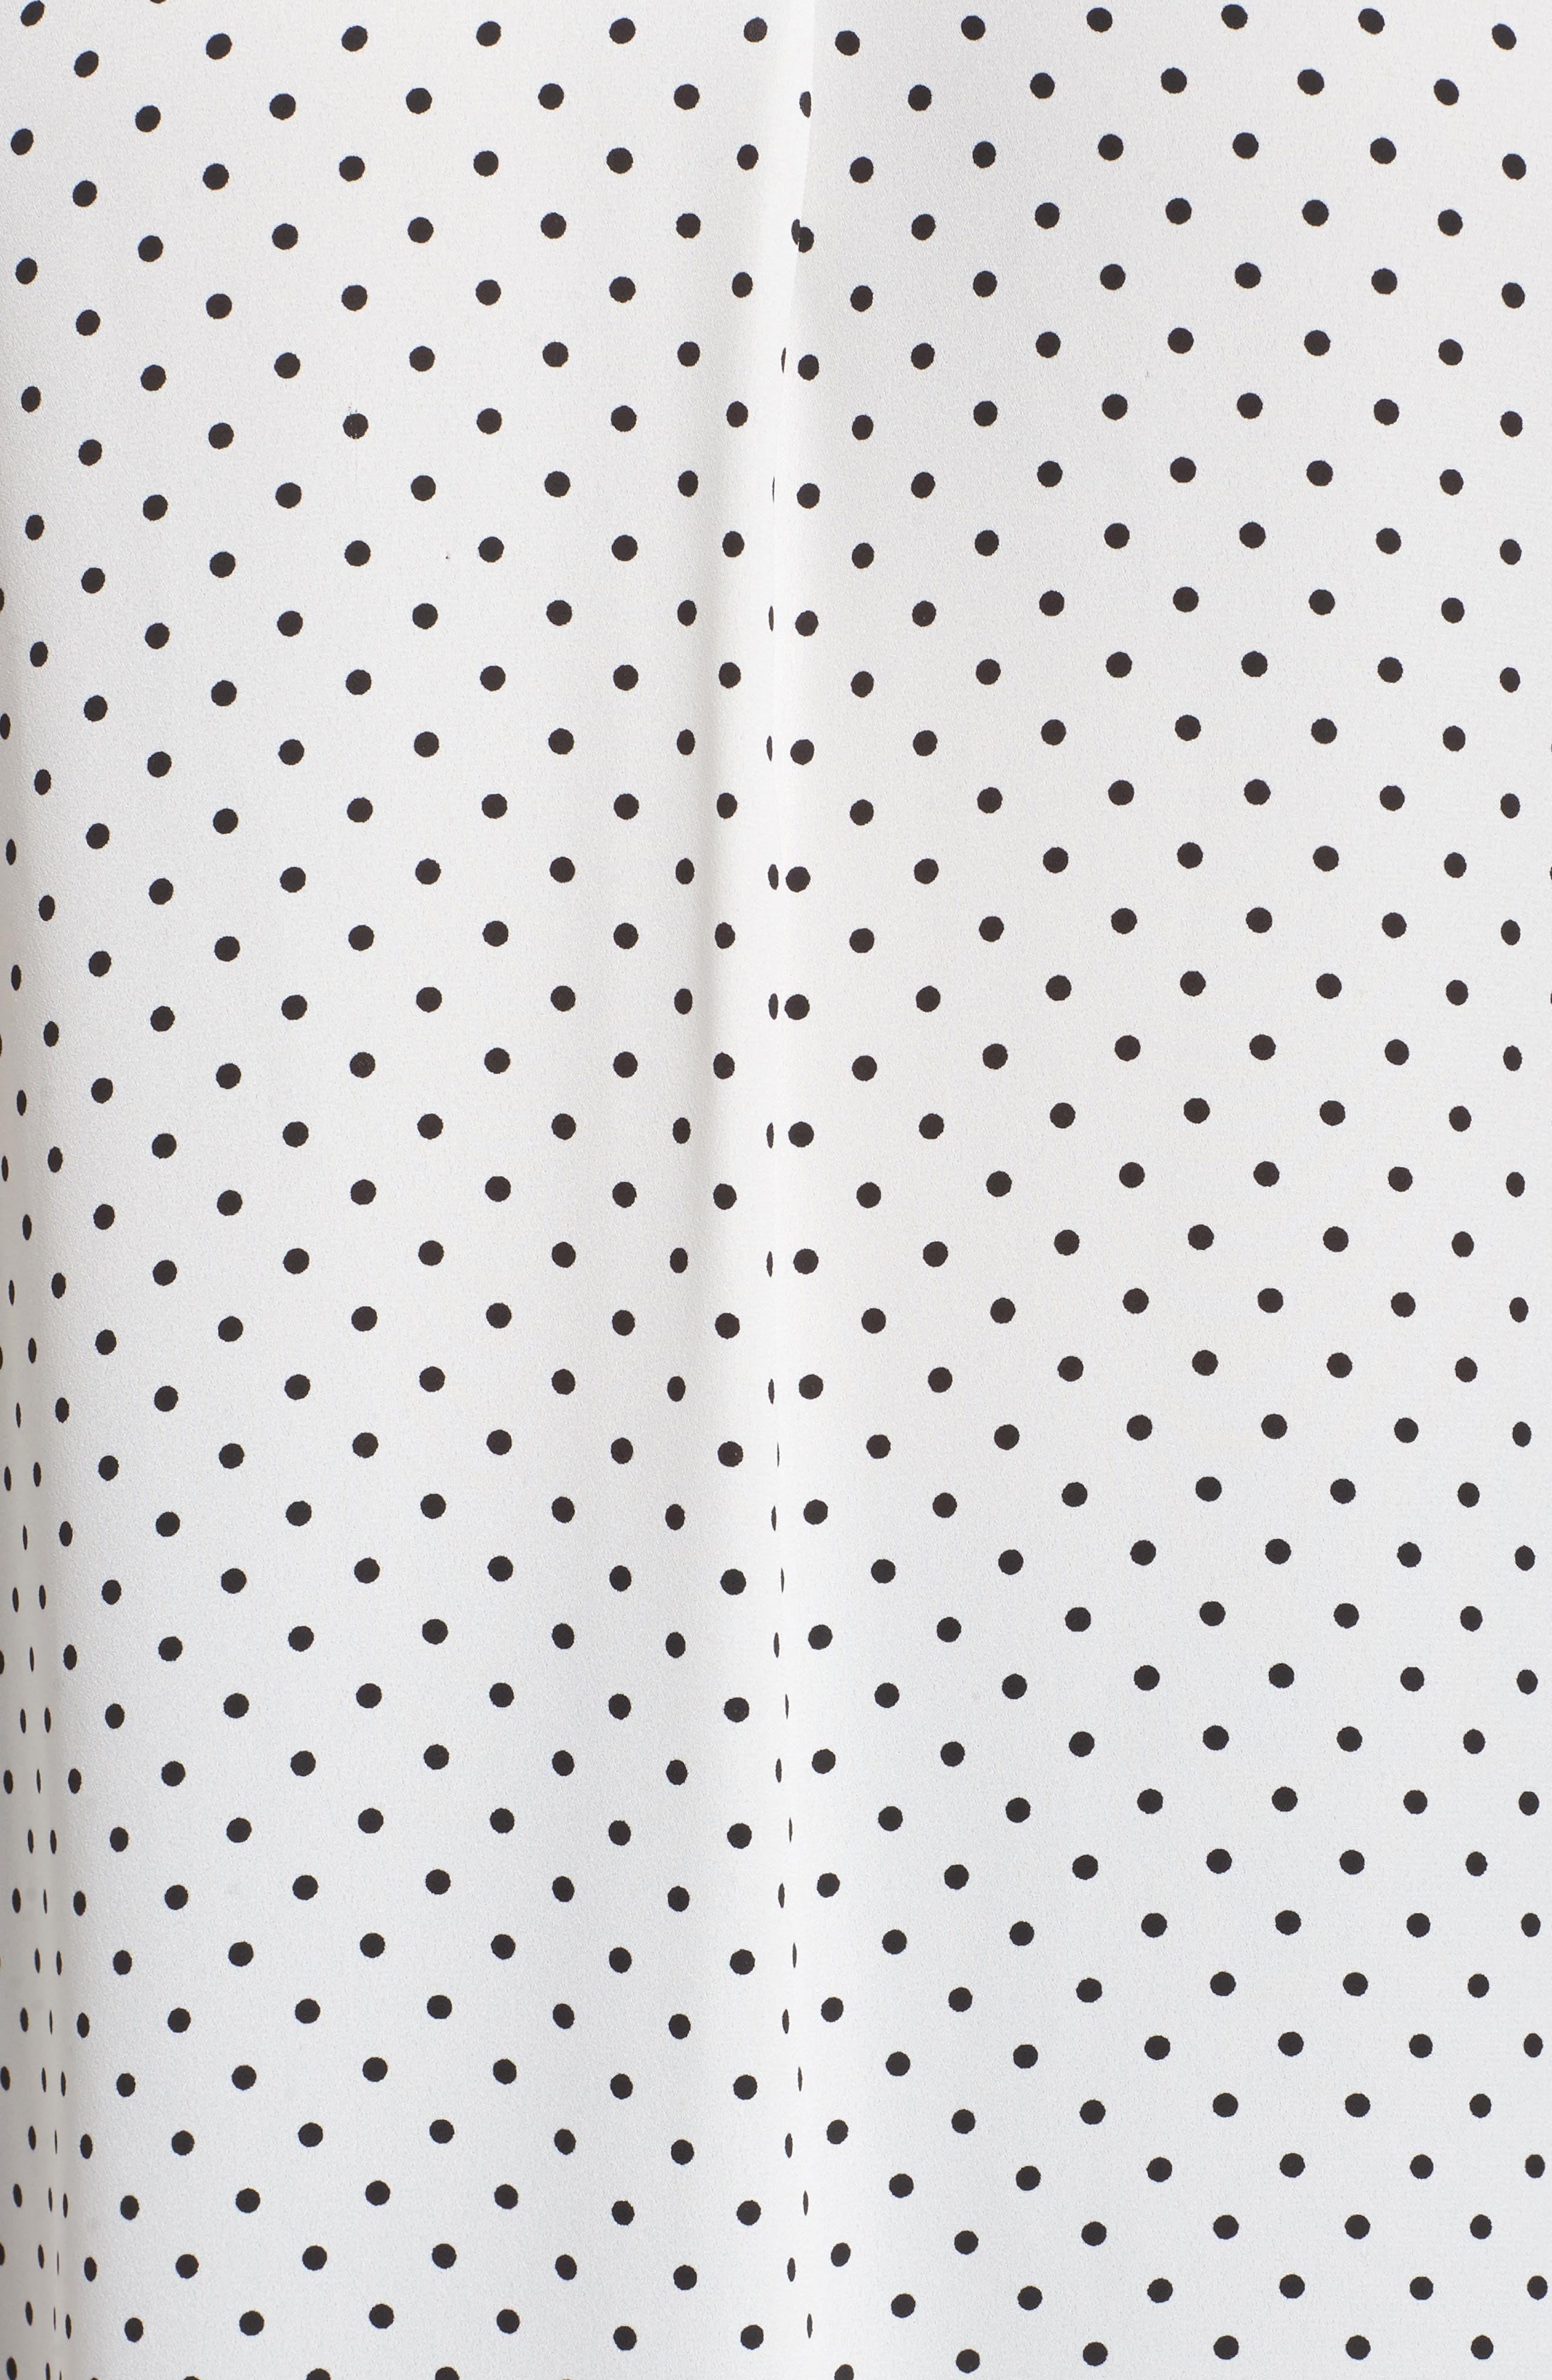 Poetic Dots Sleeveless V-Neck Blouse,                             Alternate thumbnail 5, color,                             New Ivory